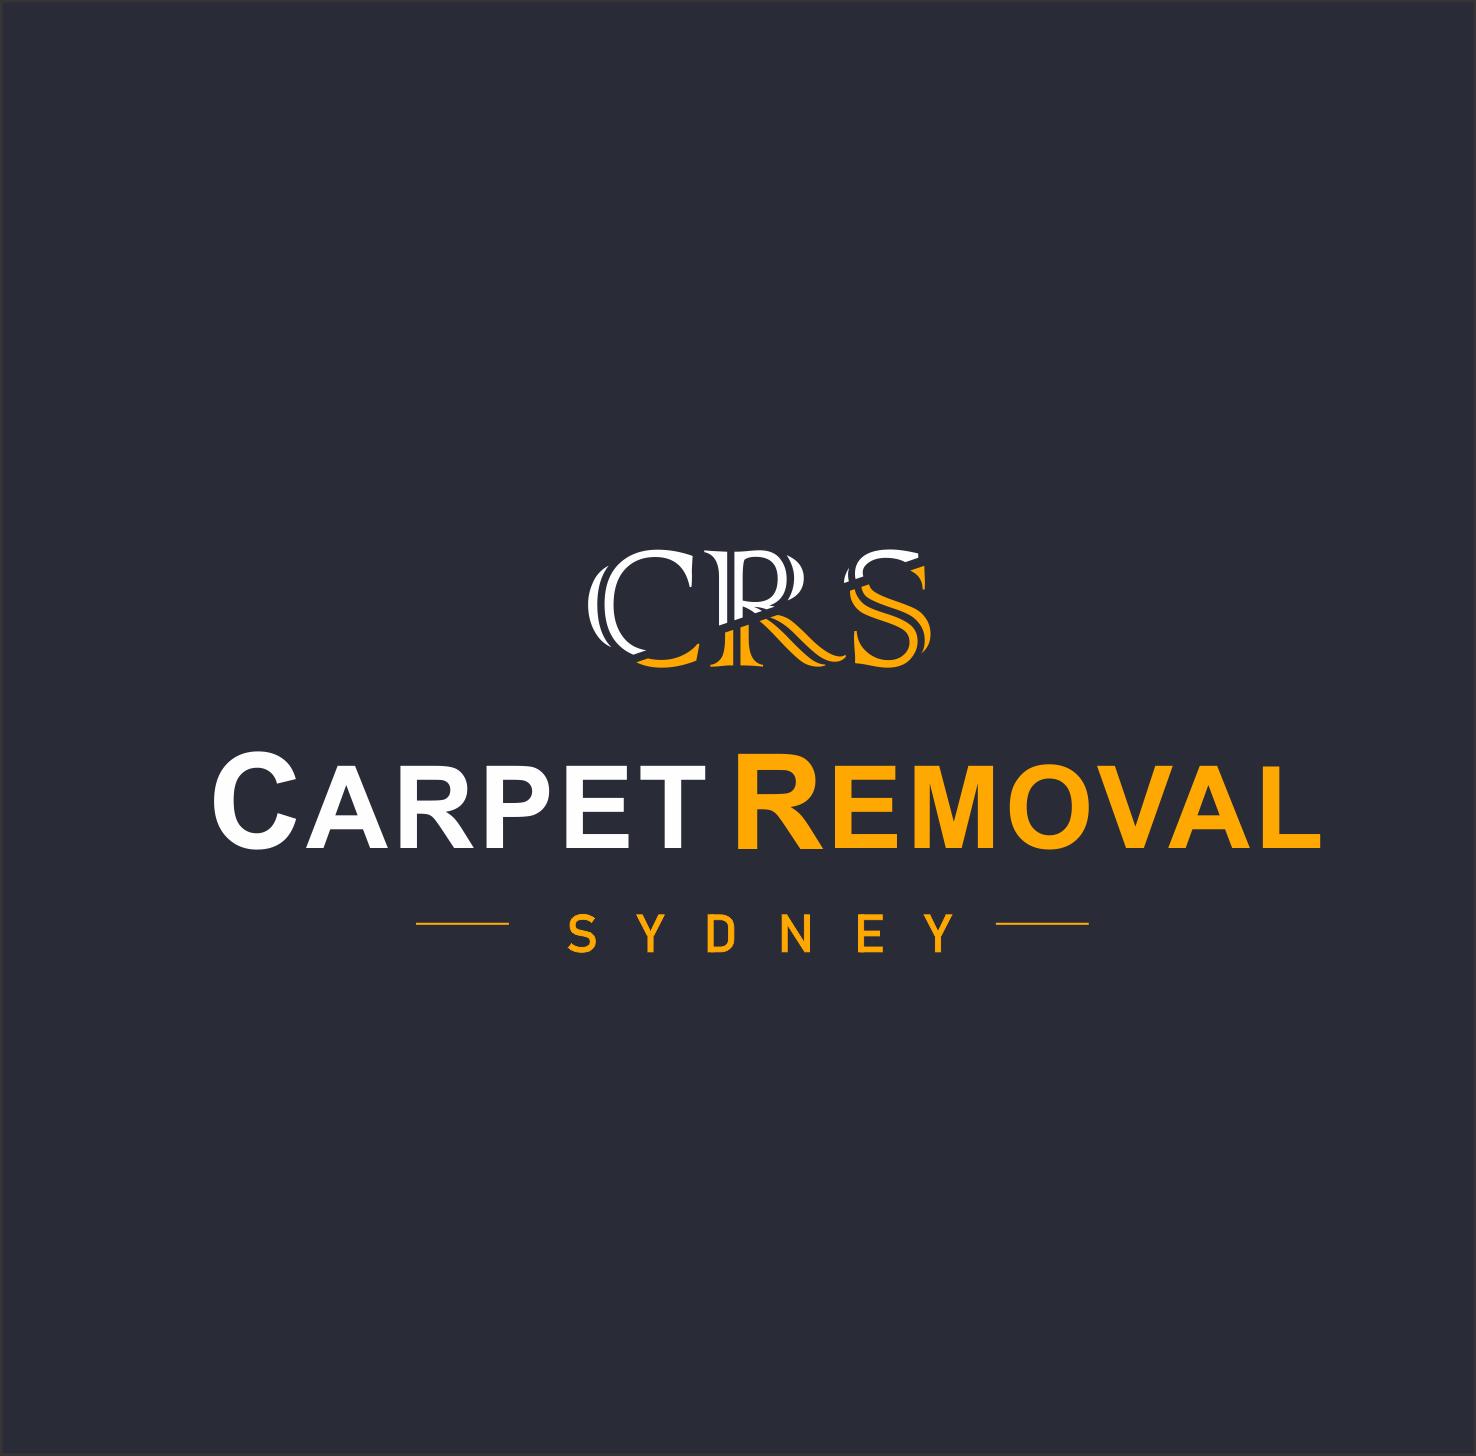 Carpet Removal Sydney Logo